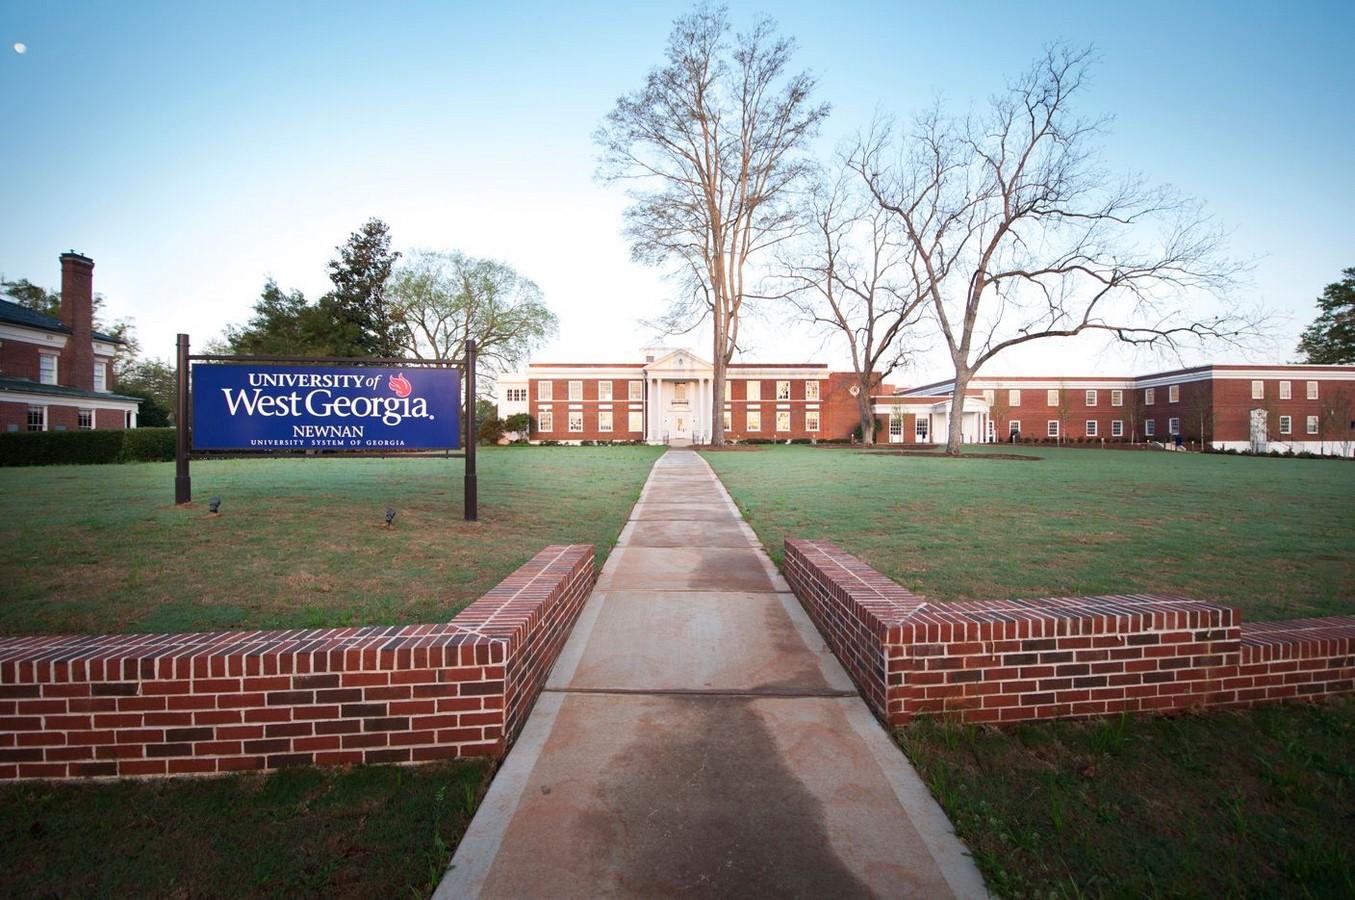 Newnan hospital renovation for the University of West Georgia - Sheet1